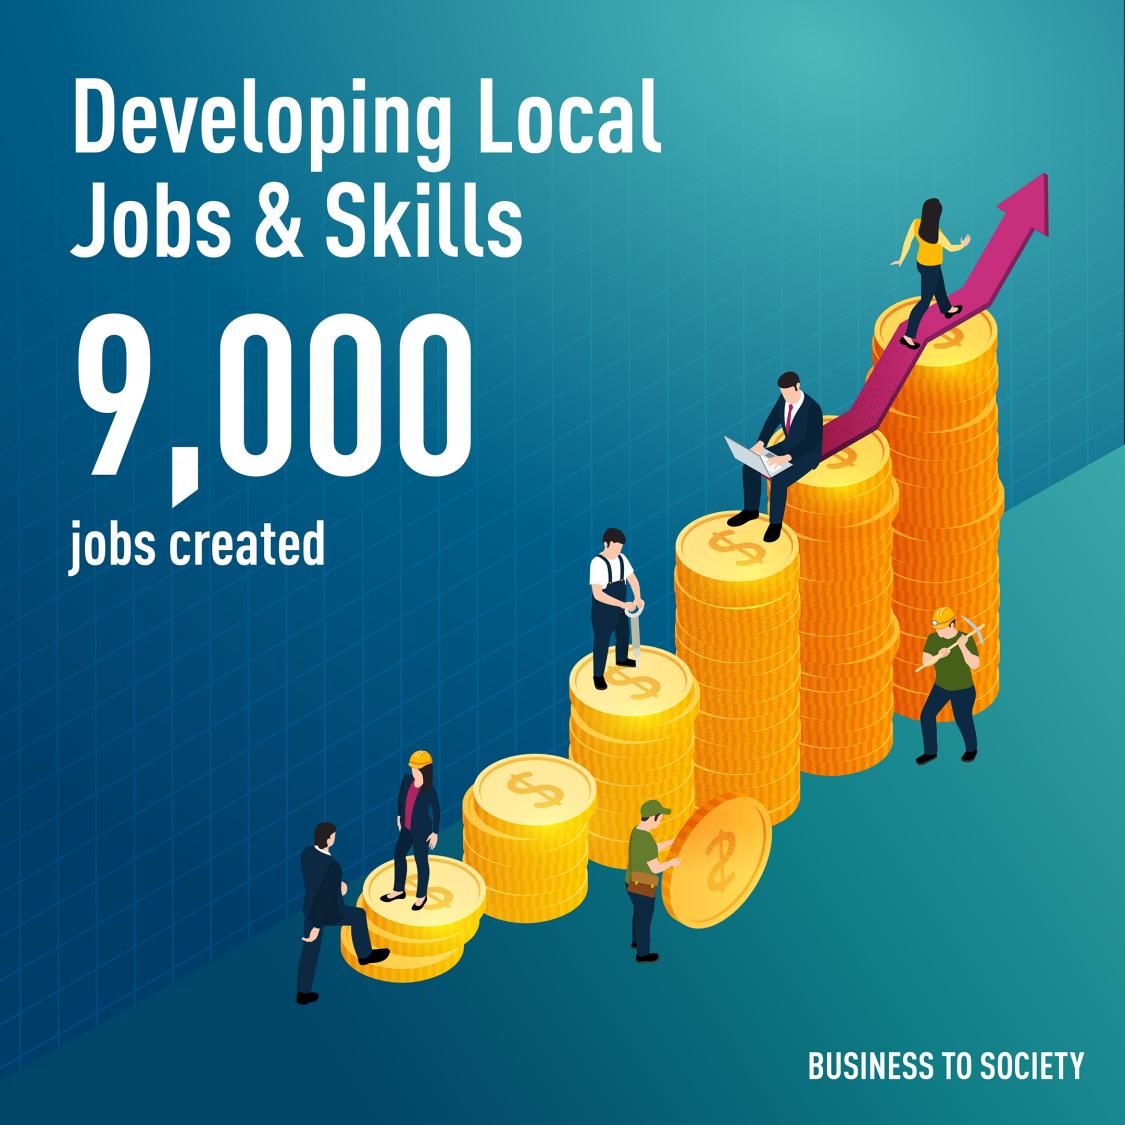 Developing local jobs & skills